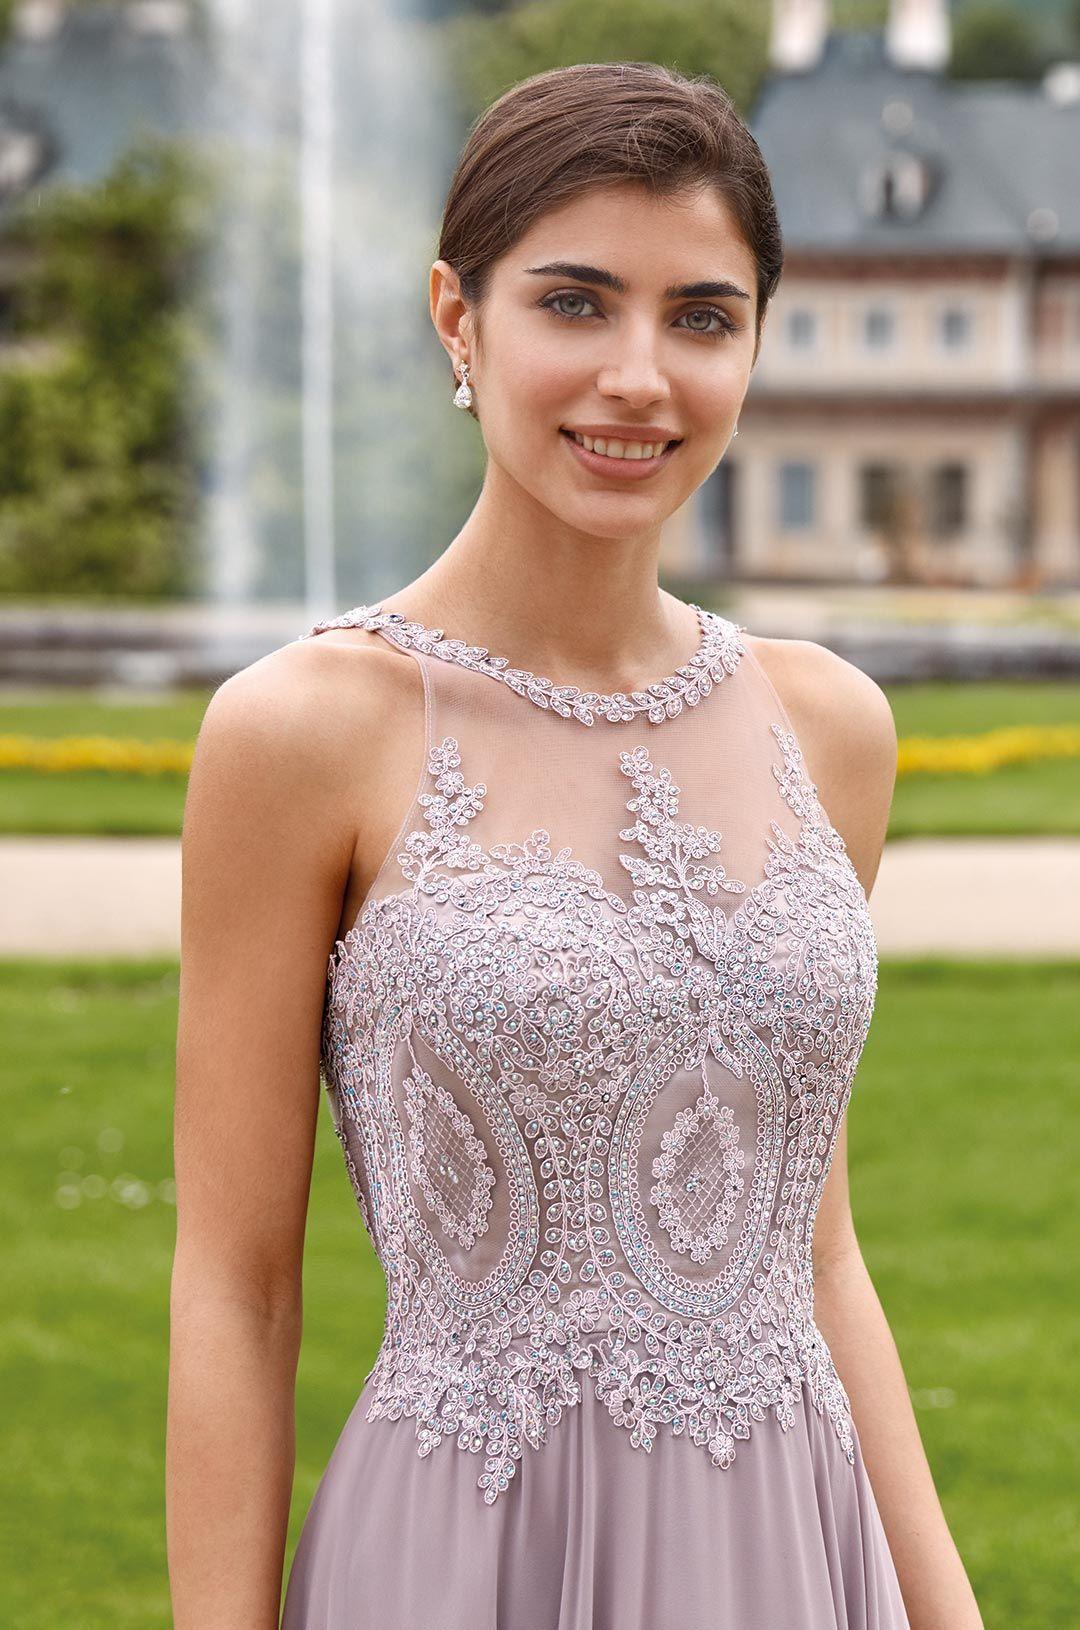 Festmode  Ballmode  Depütanntenmode - Brautmoden Tirol